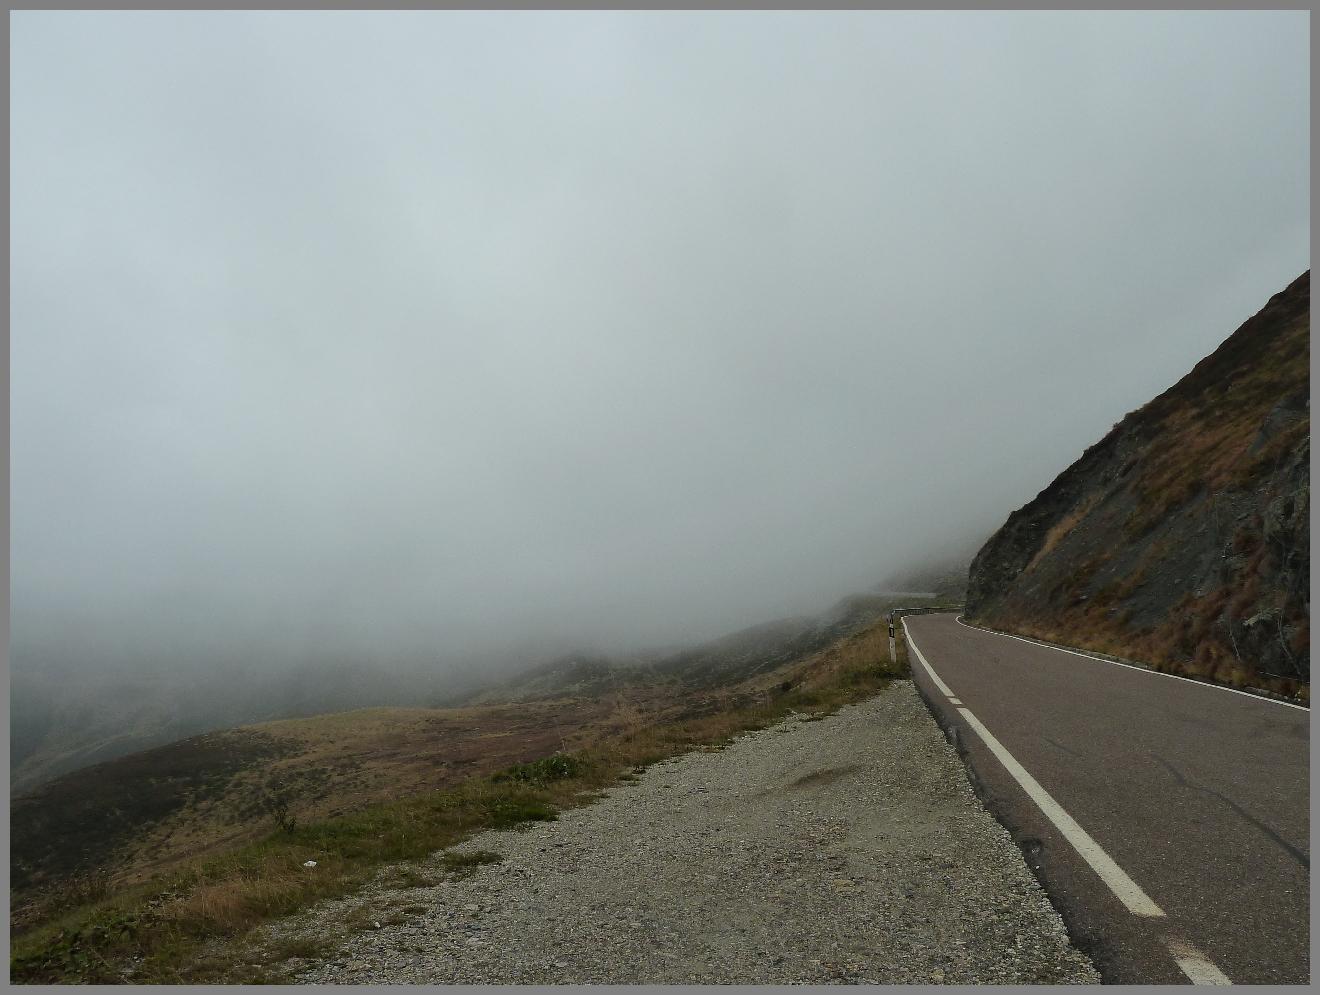 201210_moped_suedtirol_65